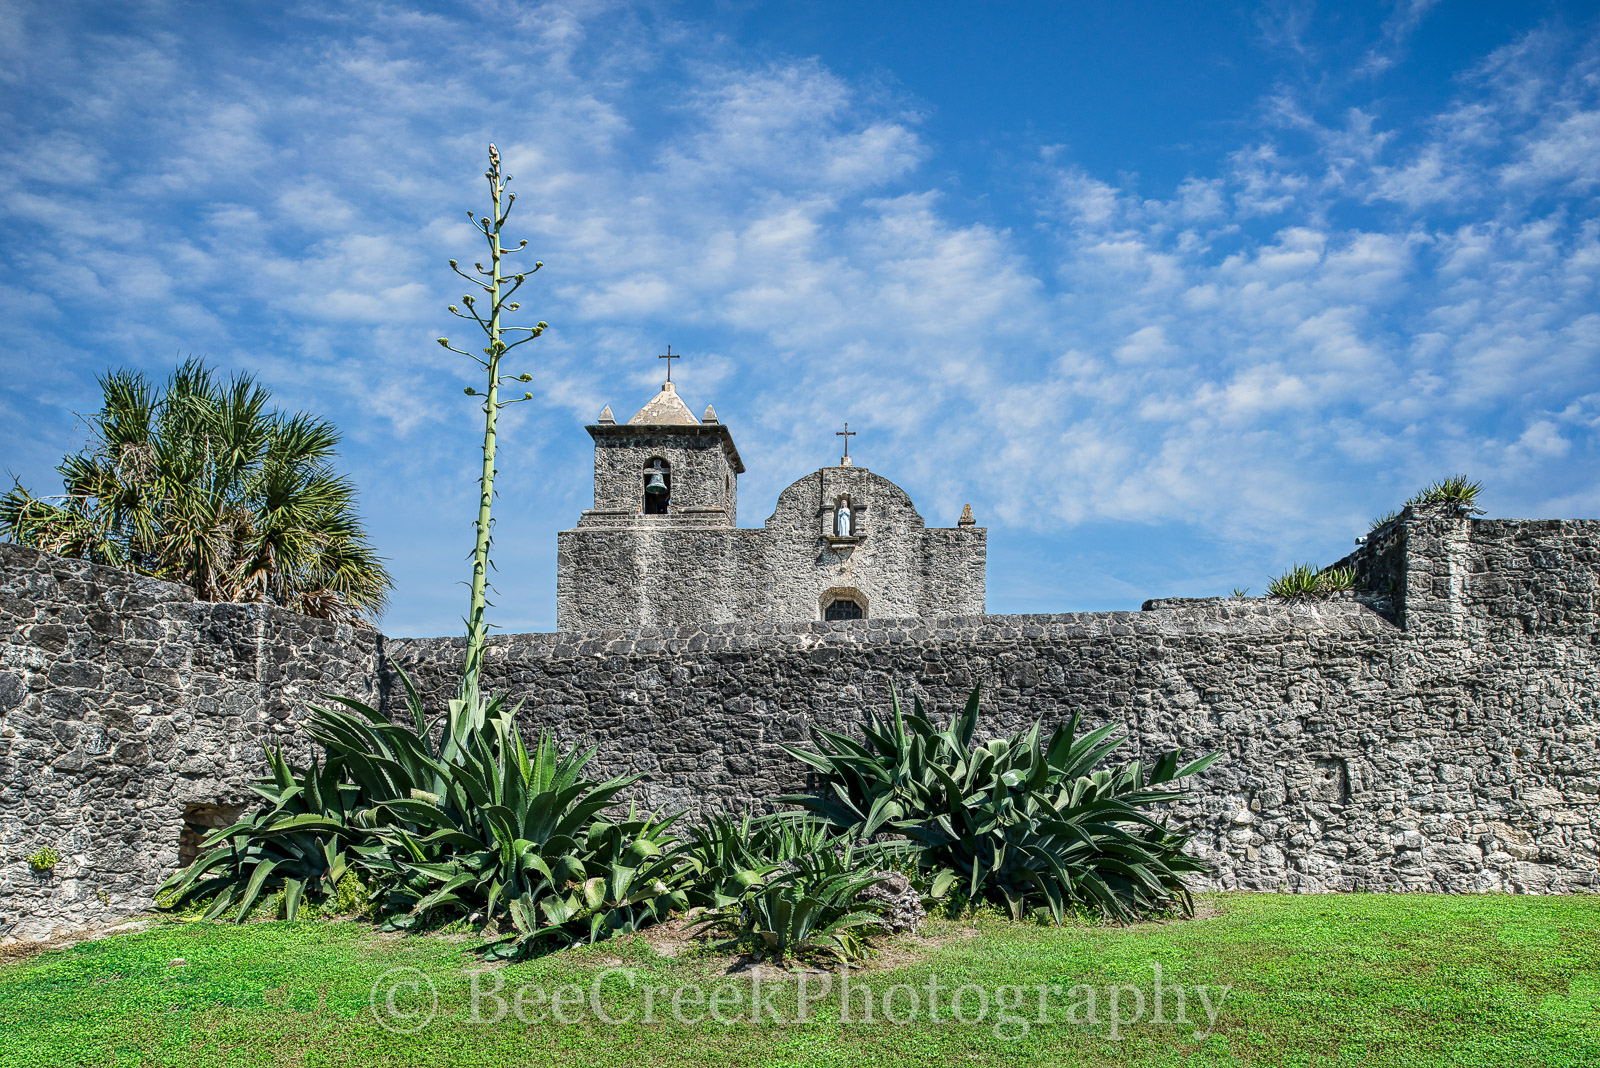 Golidad, Presidio La Bahi, catholic church, fort, historic, mission, missions, spanish, landscape, texas landscapes, , photo